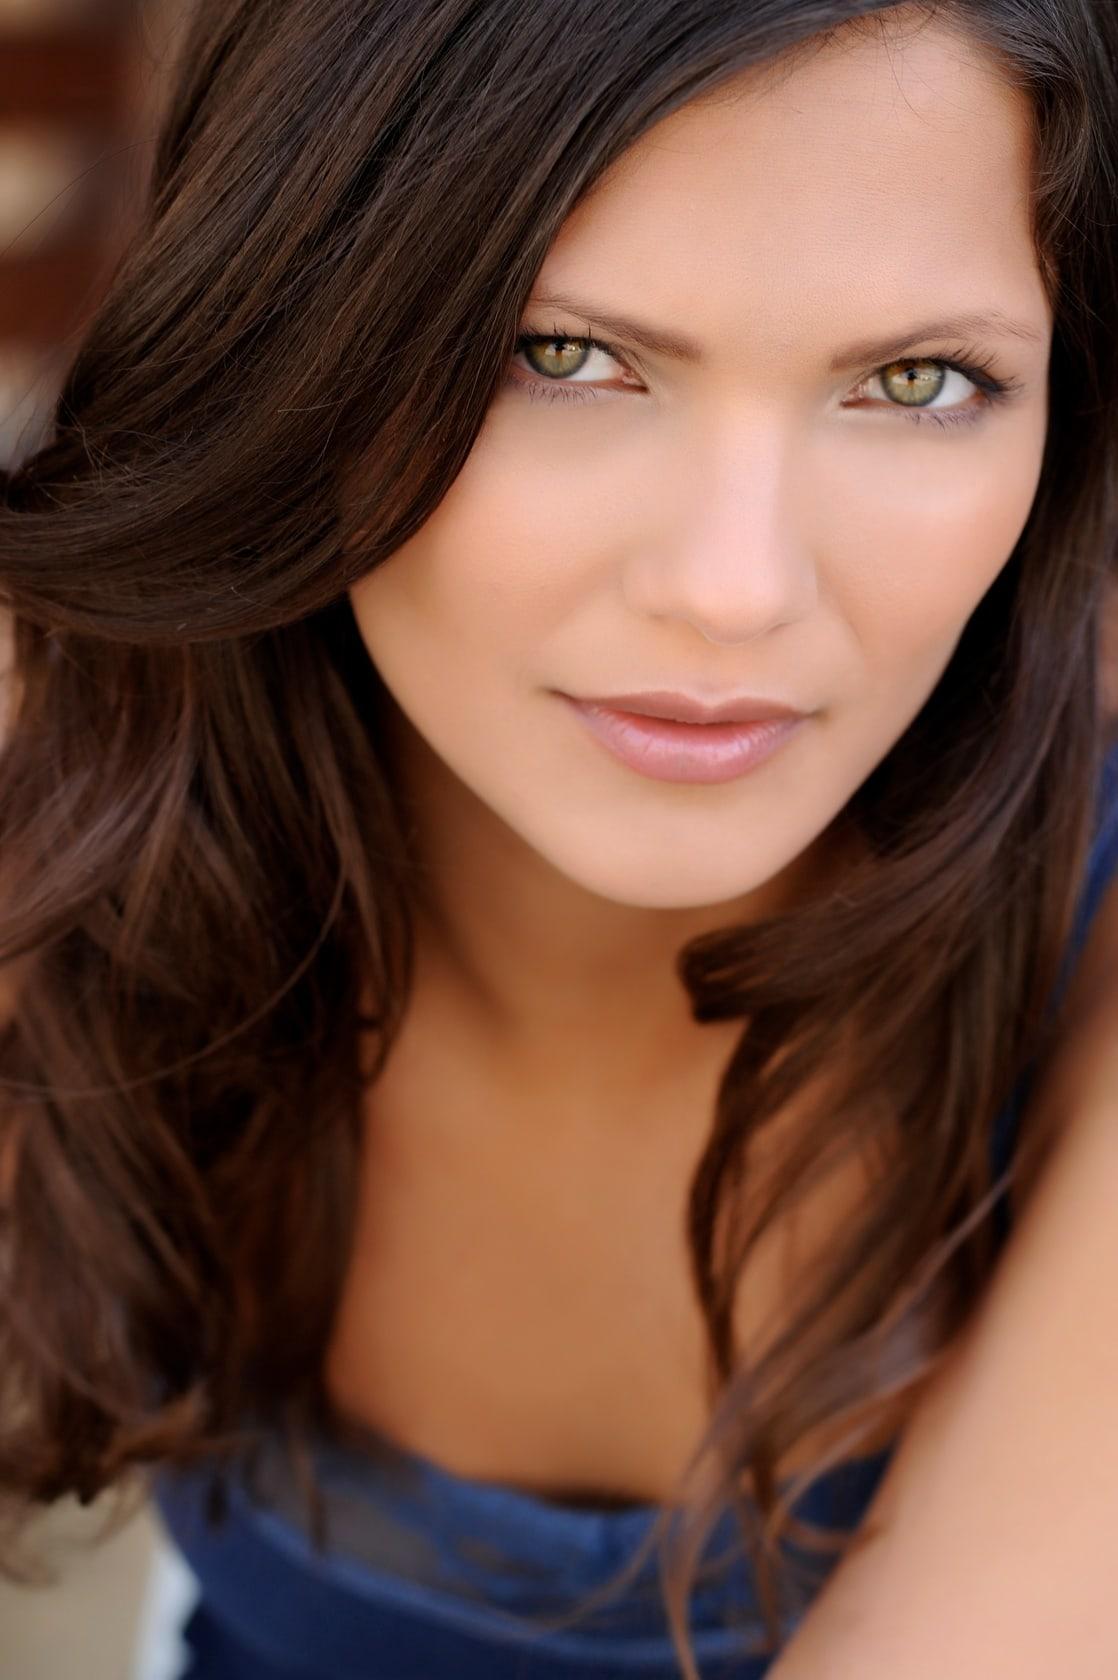 Andrea Mason (actress) XXX archive Nancy Lenehan,Karla Estrada (b. 1976)